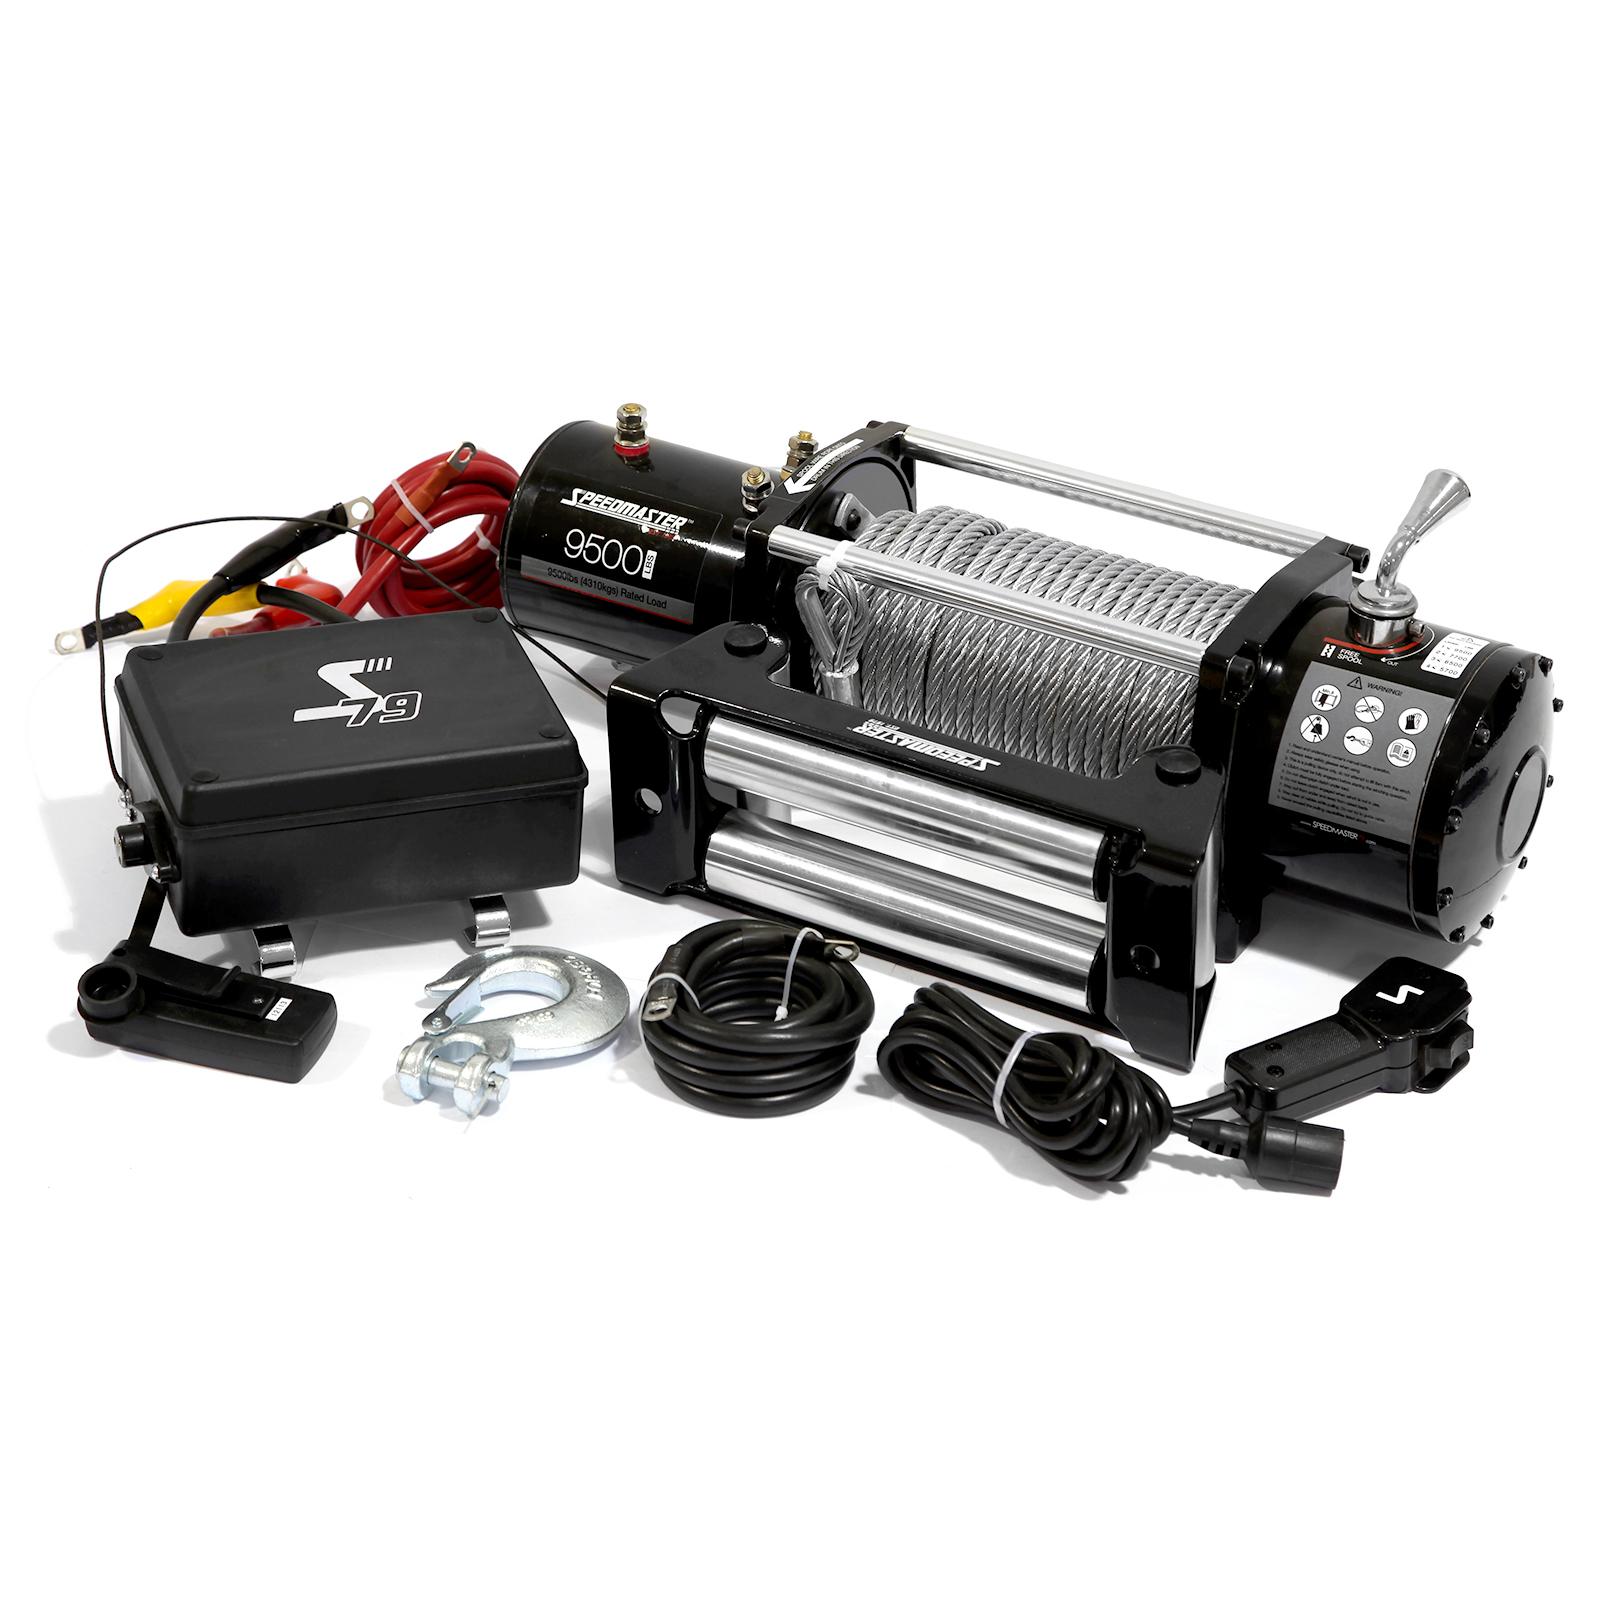 9500lbs / 4310kgs 12V Electric 4wd Winch Kit w/ Wireless Remote